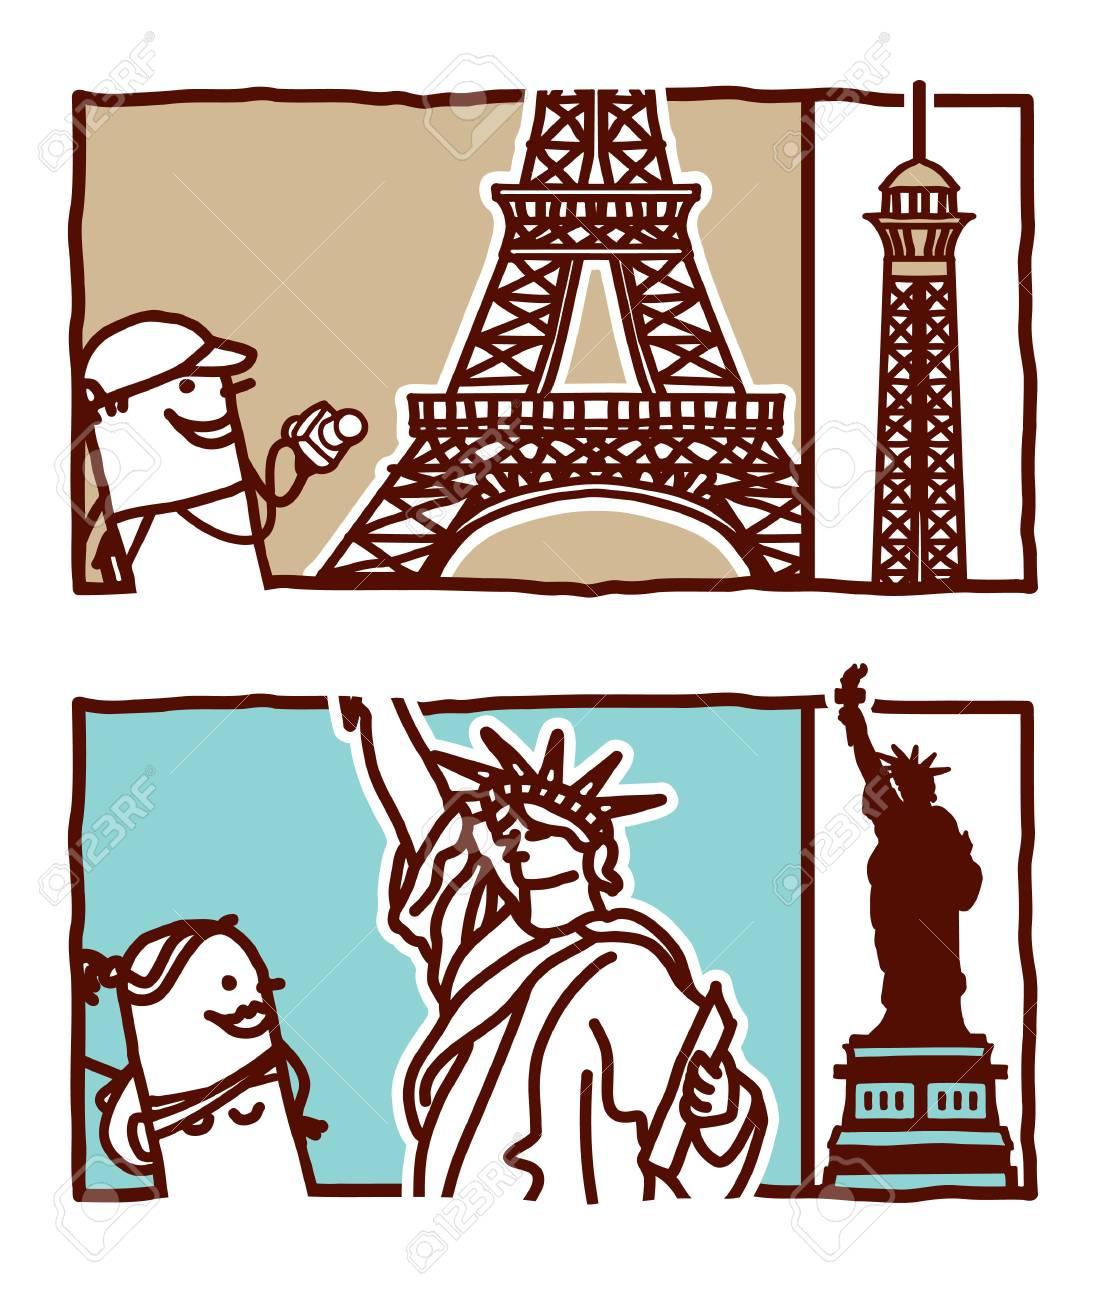 Fullsize Of Eiffel Tower Cartoon